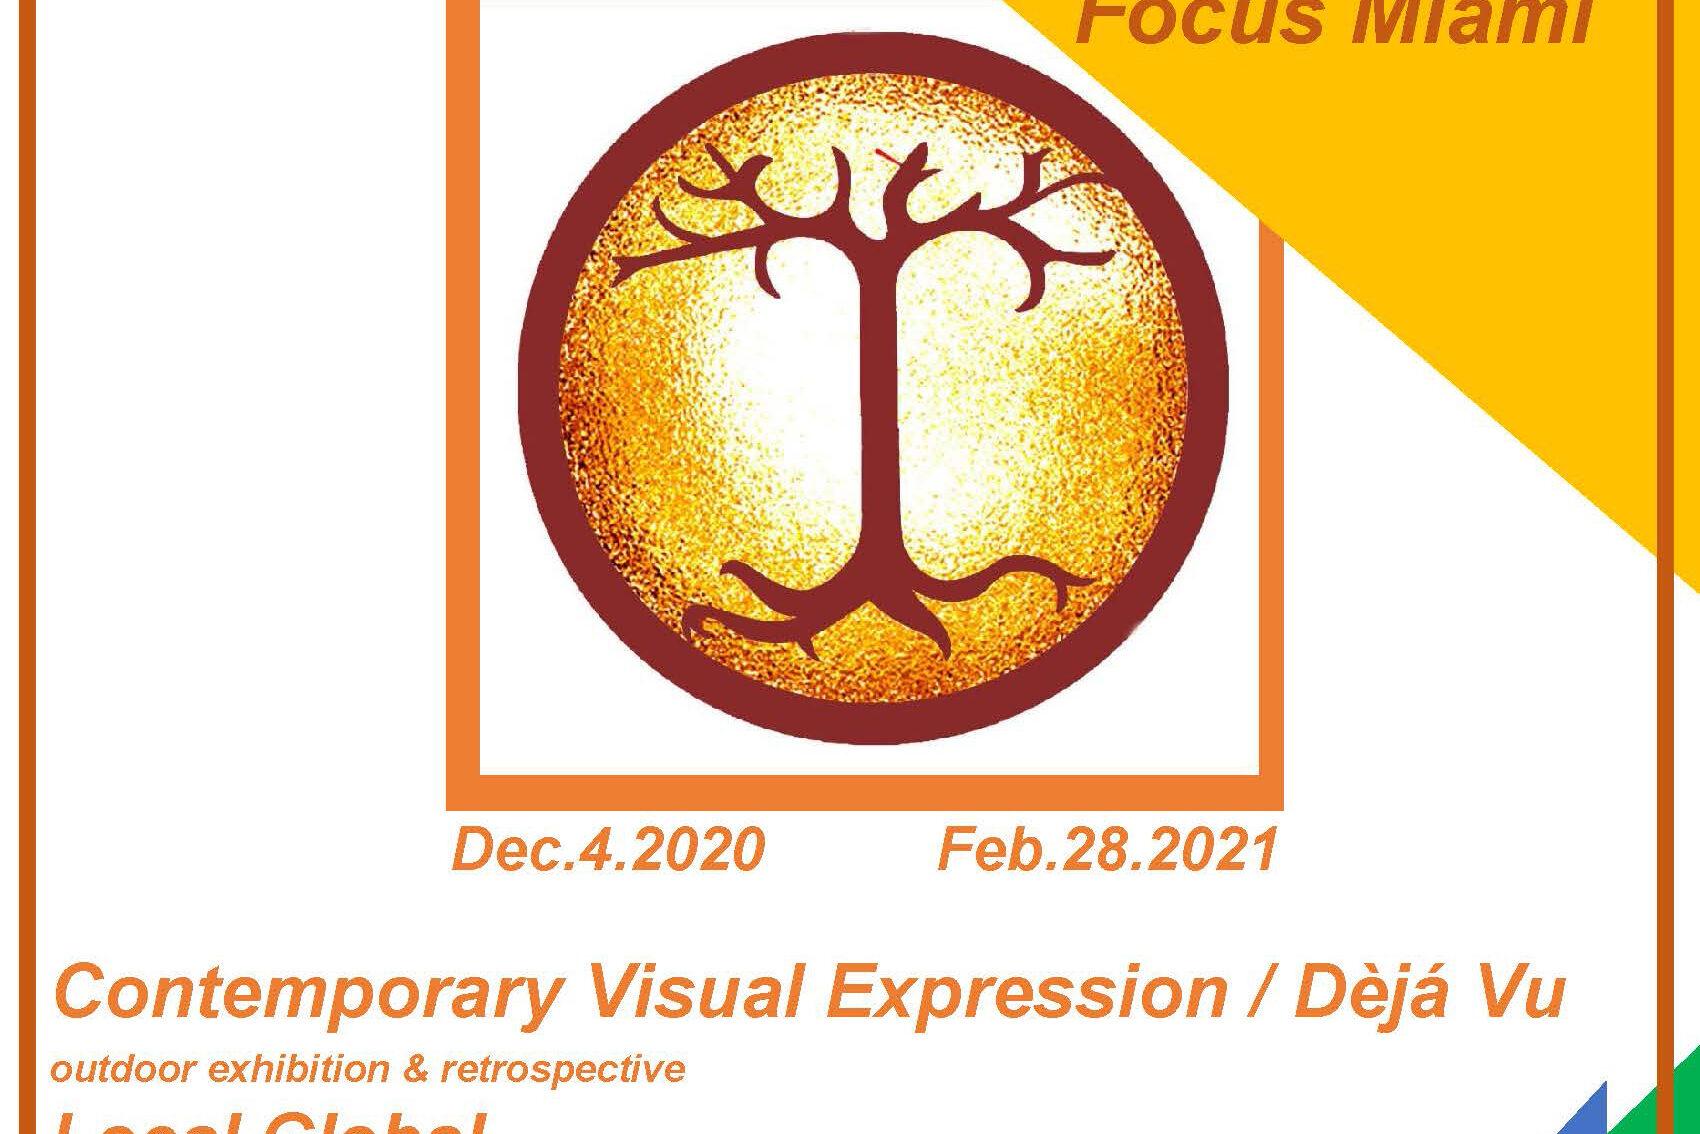 Global / Borderless Caribbean XII: Focus Miami